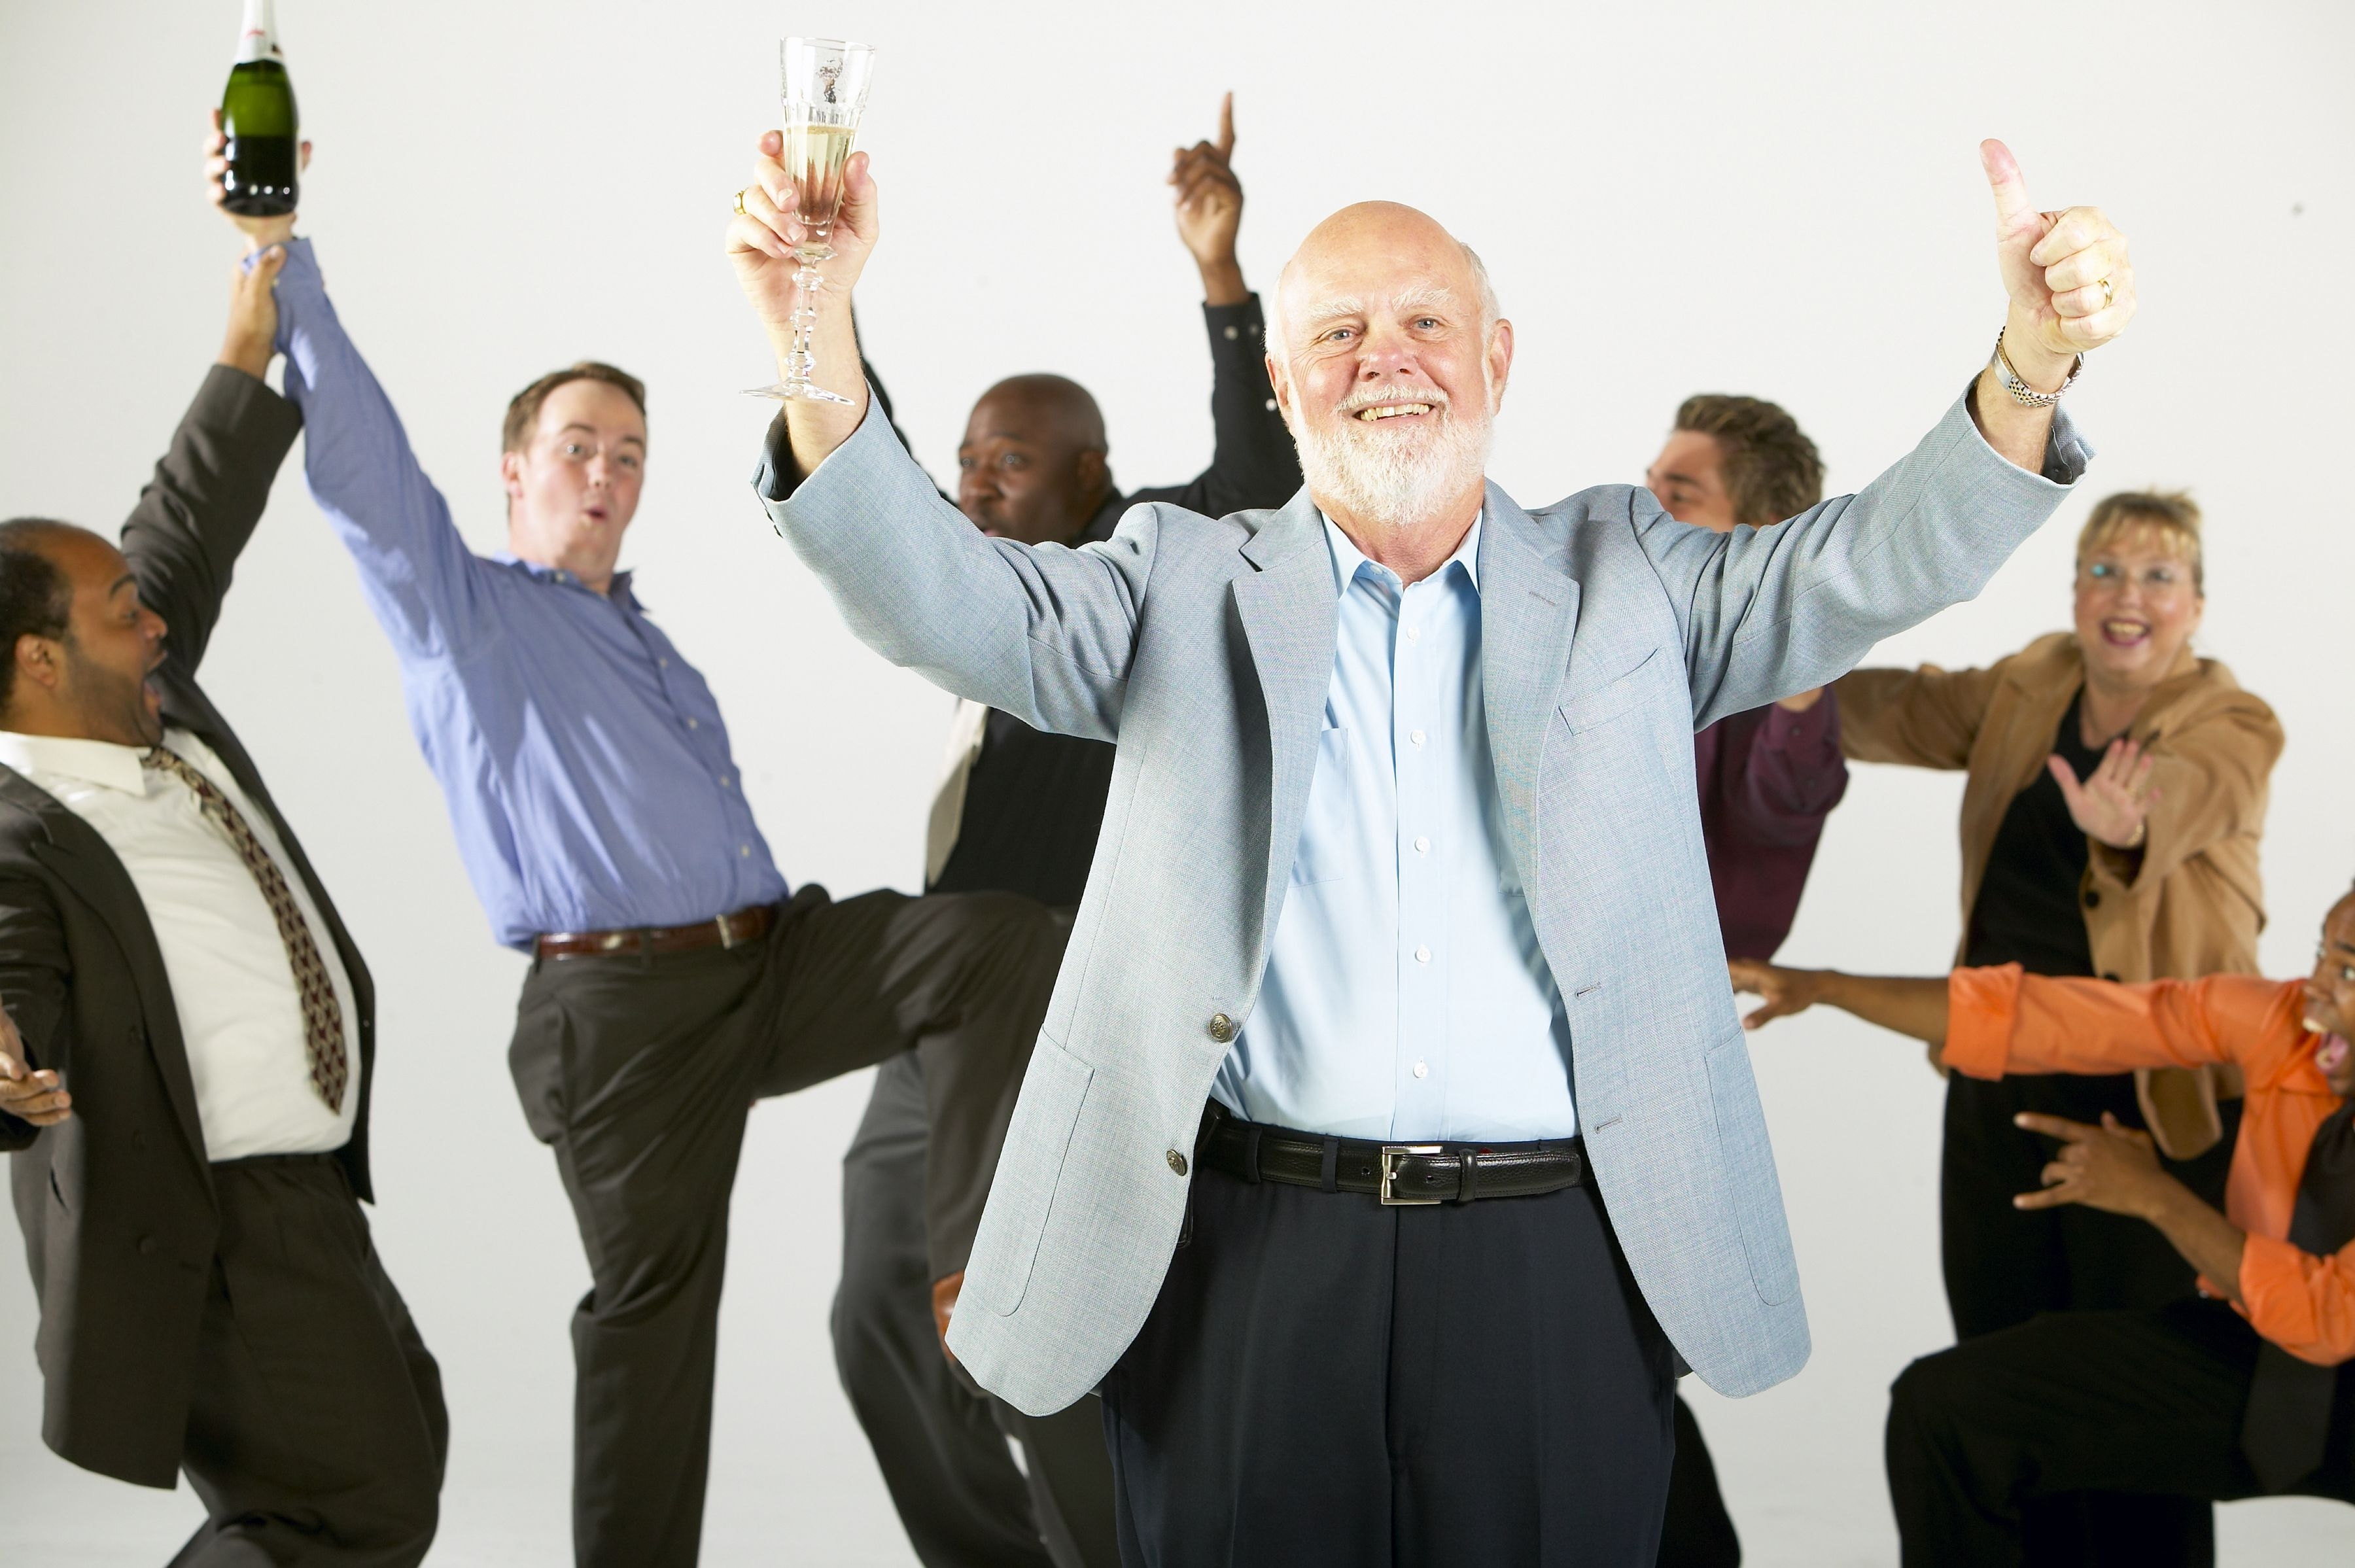 How to Design a Retirement Celebration Program Career Trend